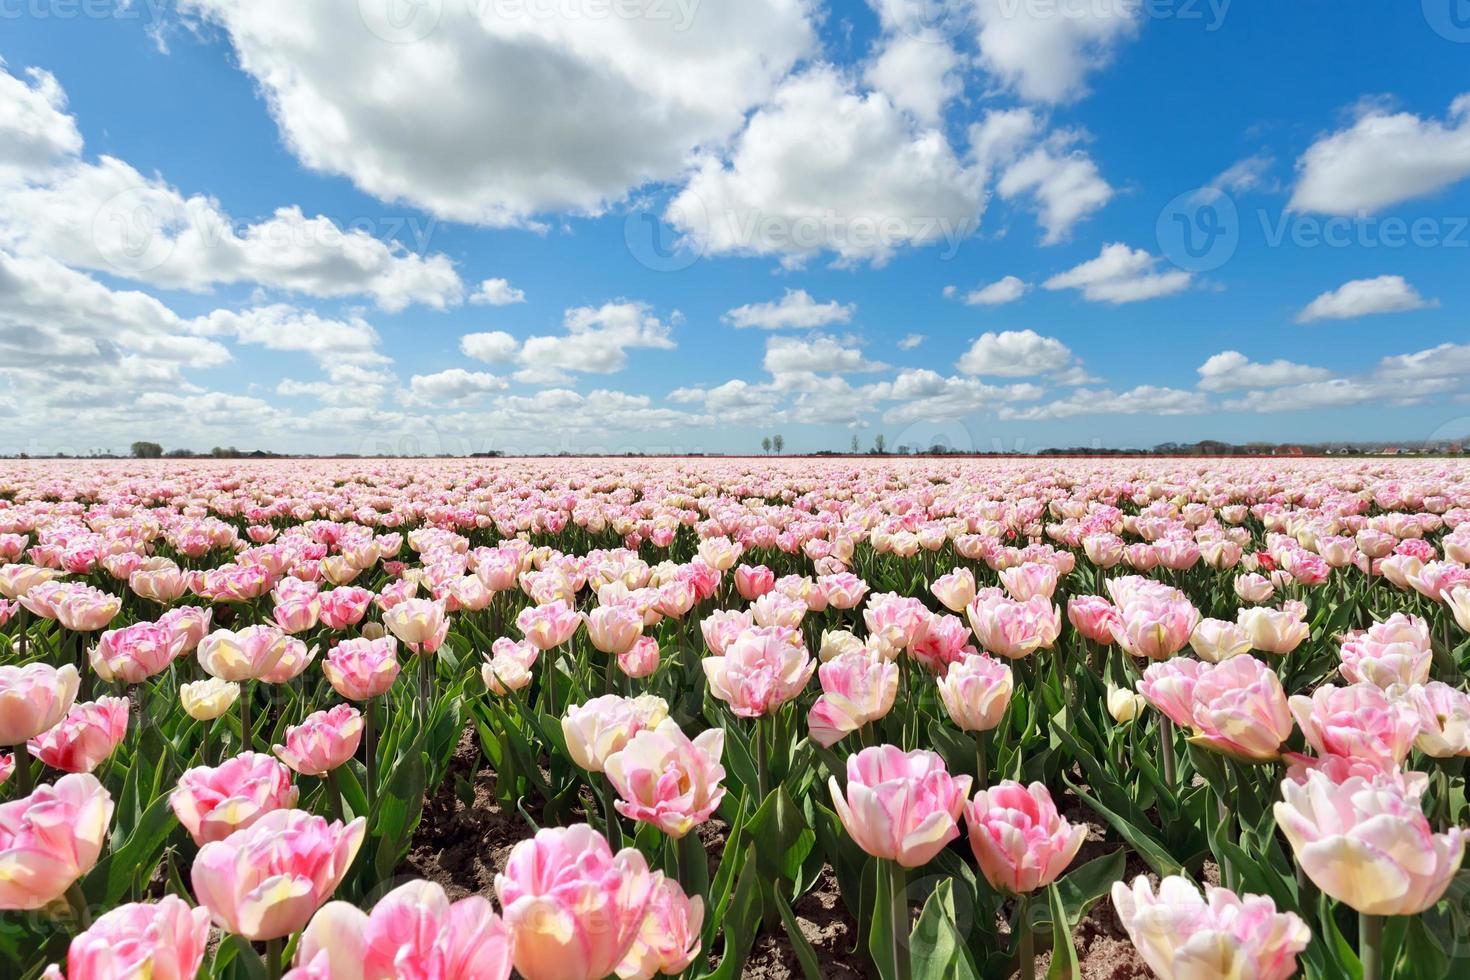 champ de tulipes roses et ciel bleu photo